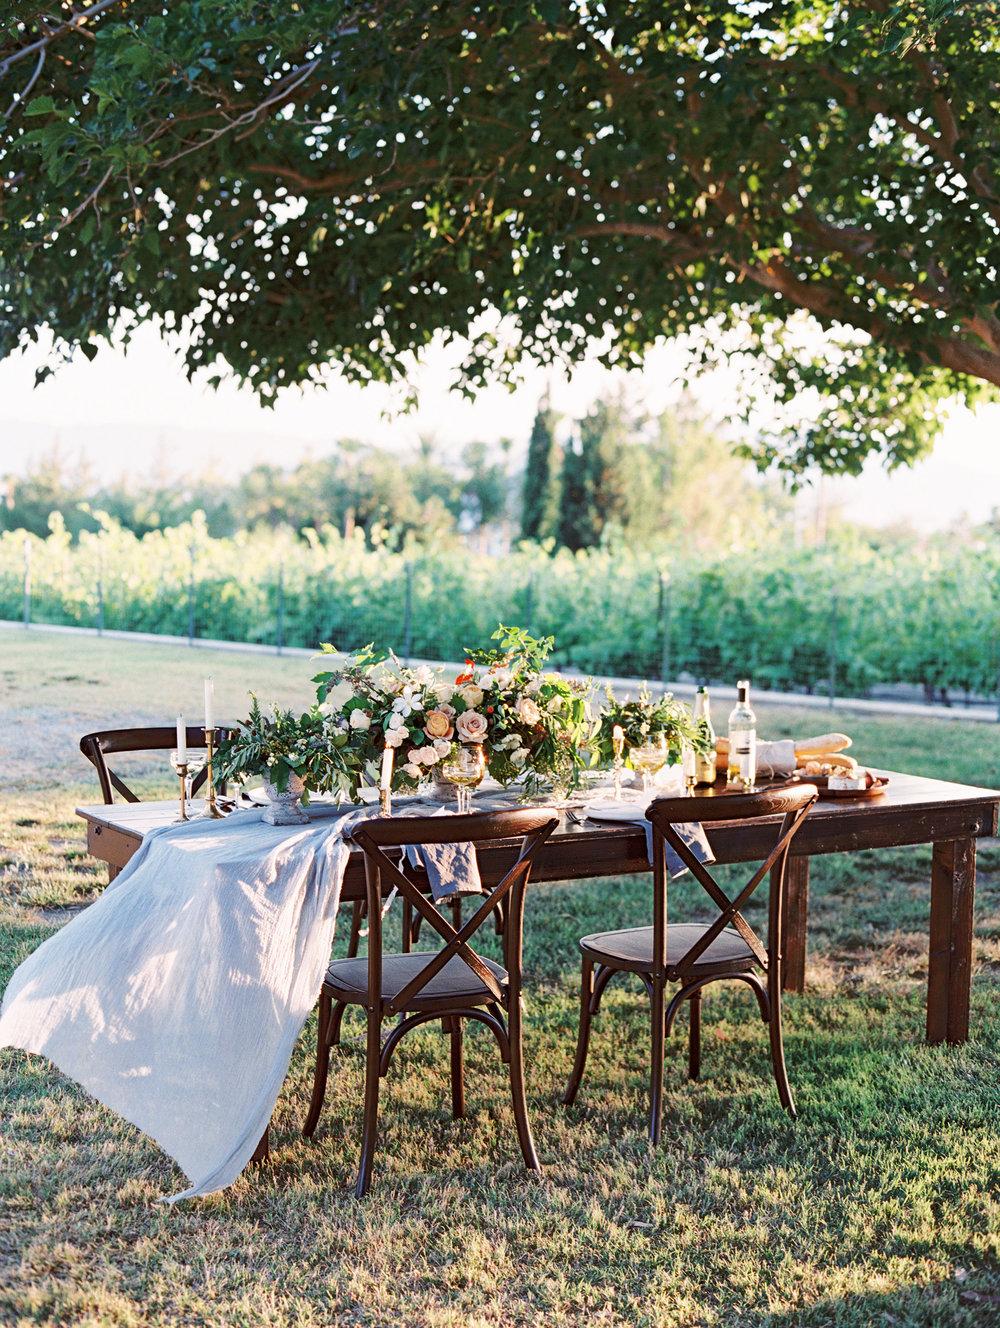 pantone-color-of-the-year-greenery-las-vegas-winery-wedding